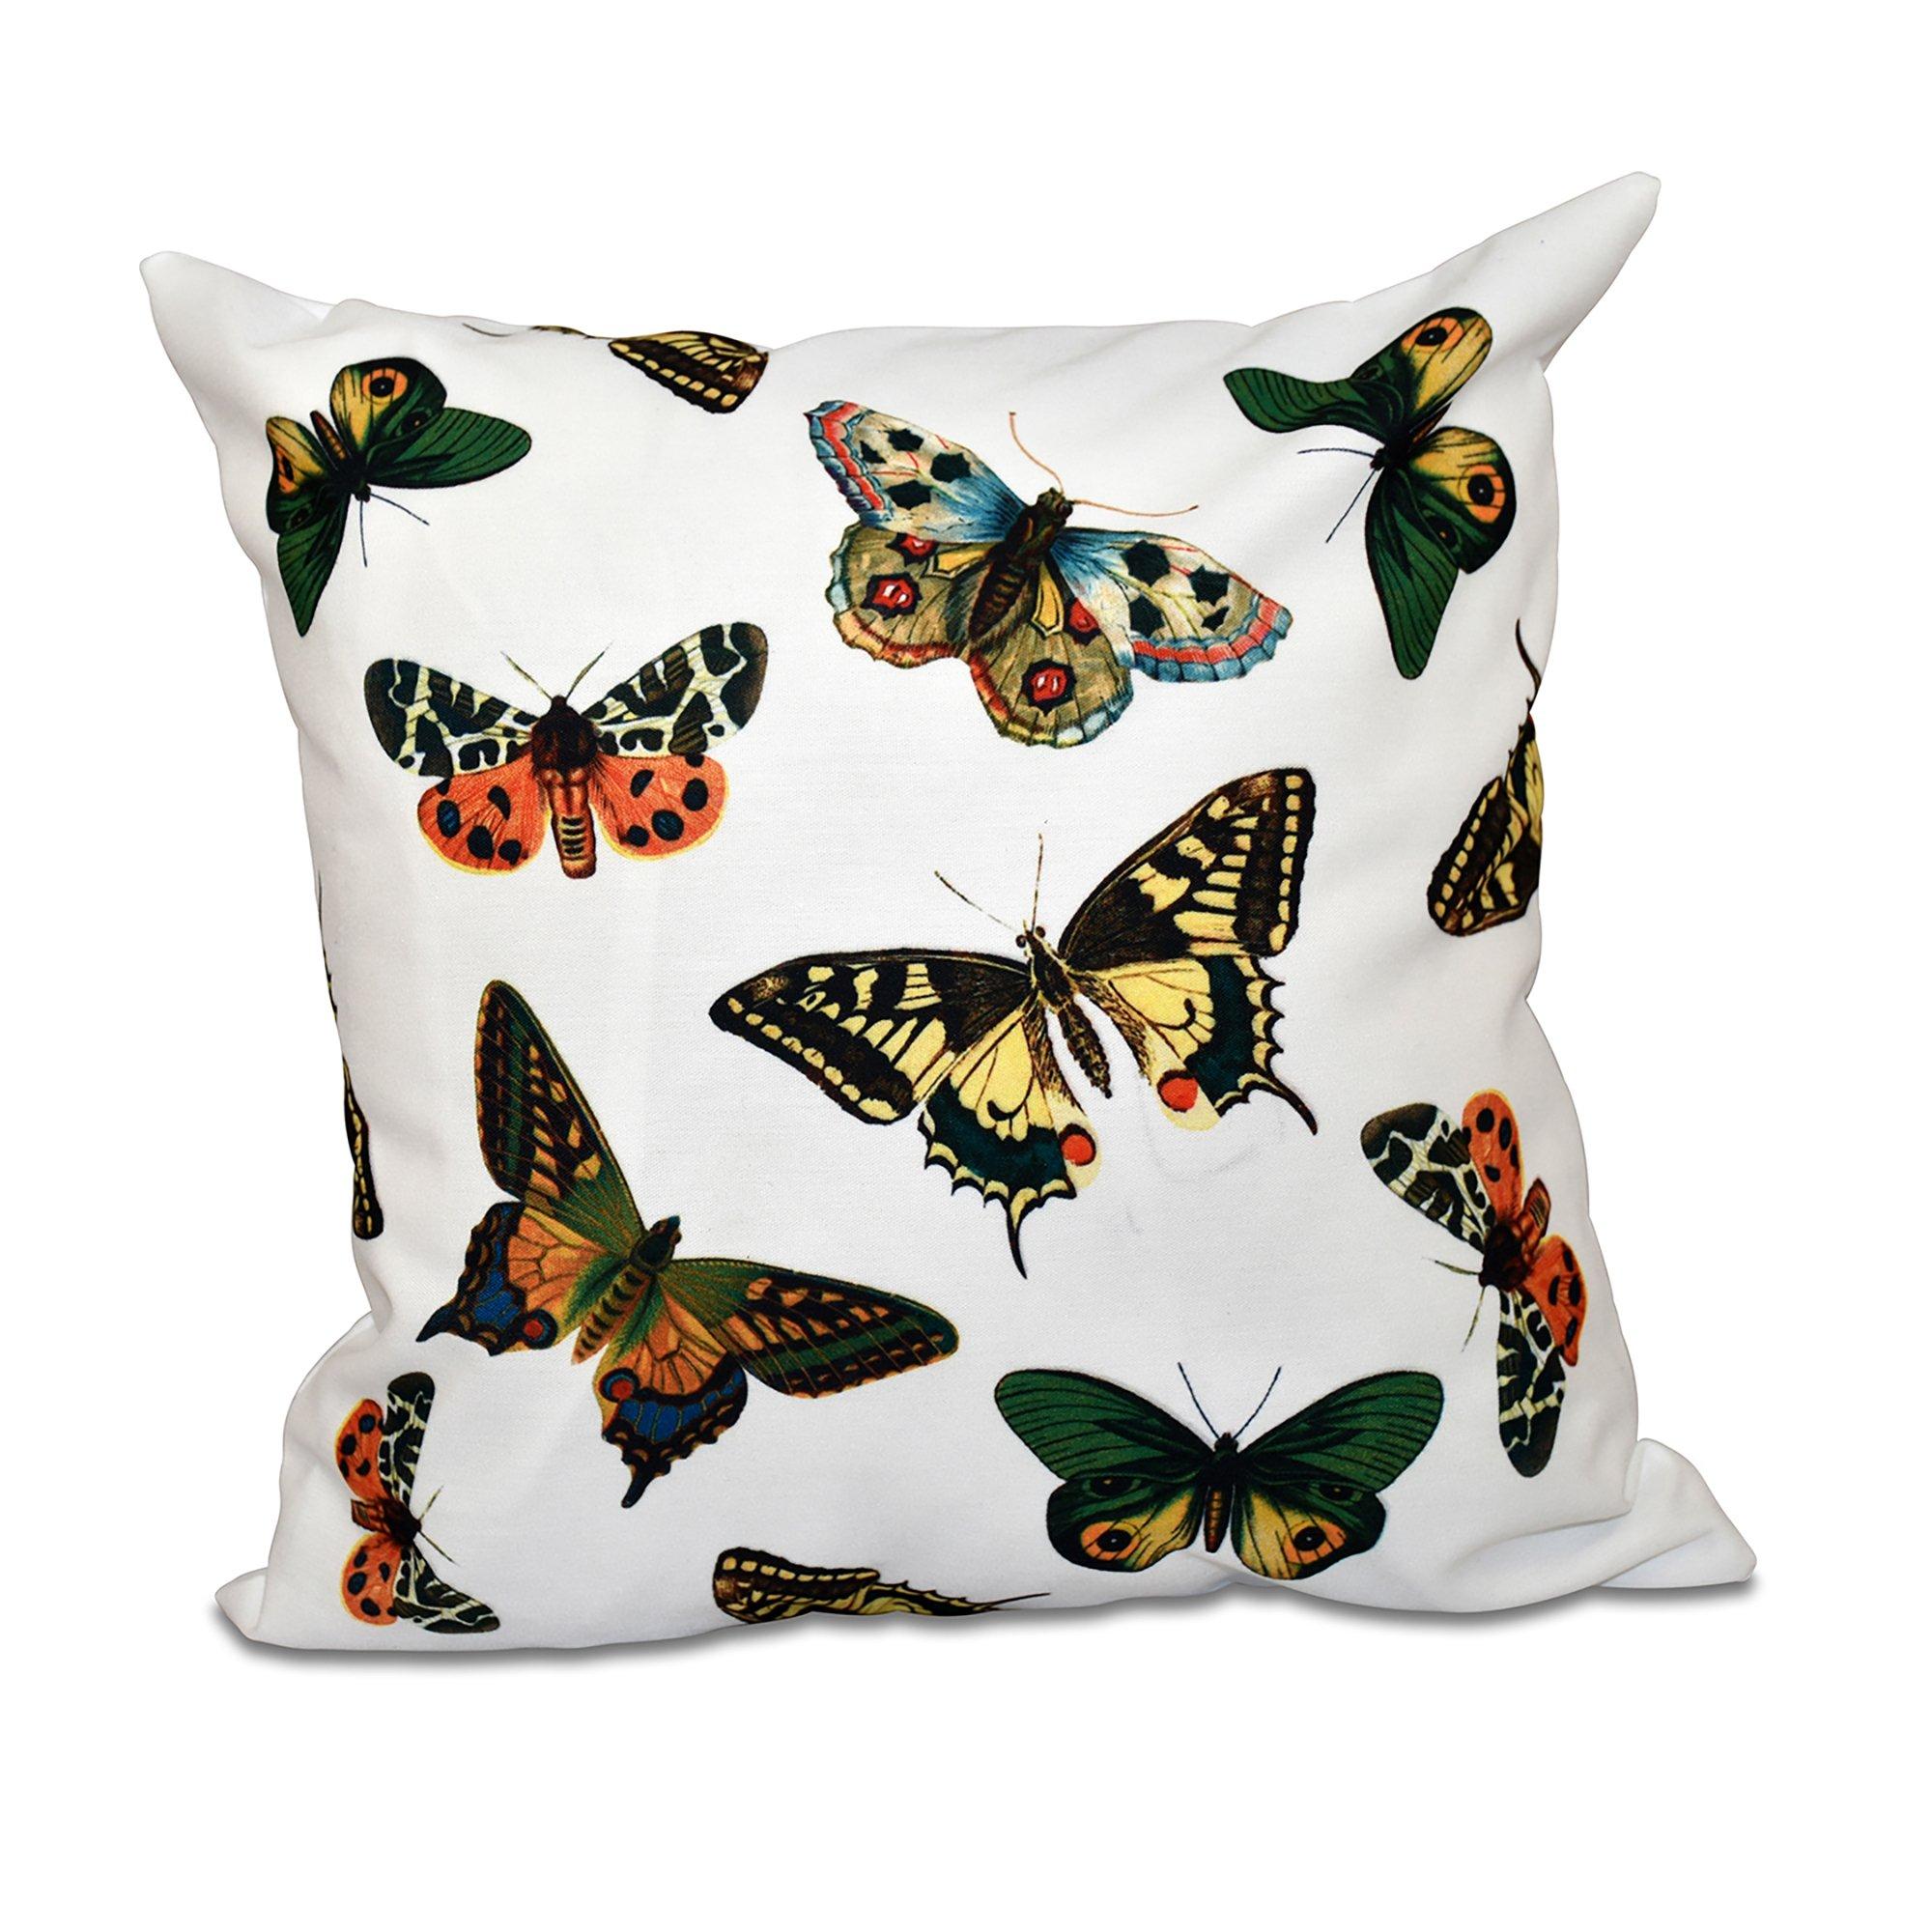 E by design 26 x 26-inch, Butterflies, Animal Print Pillow, White